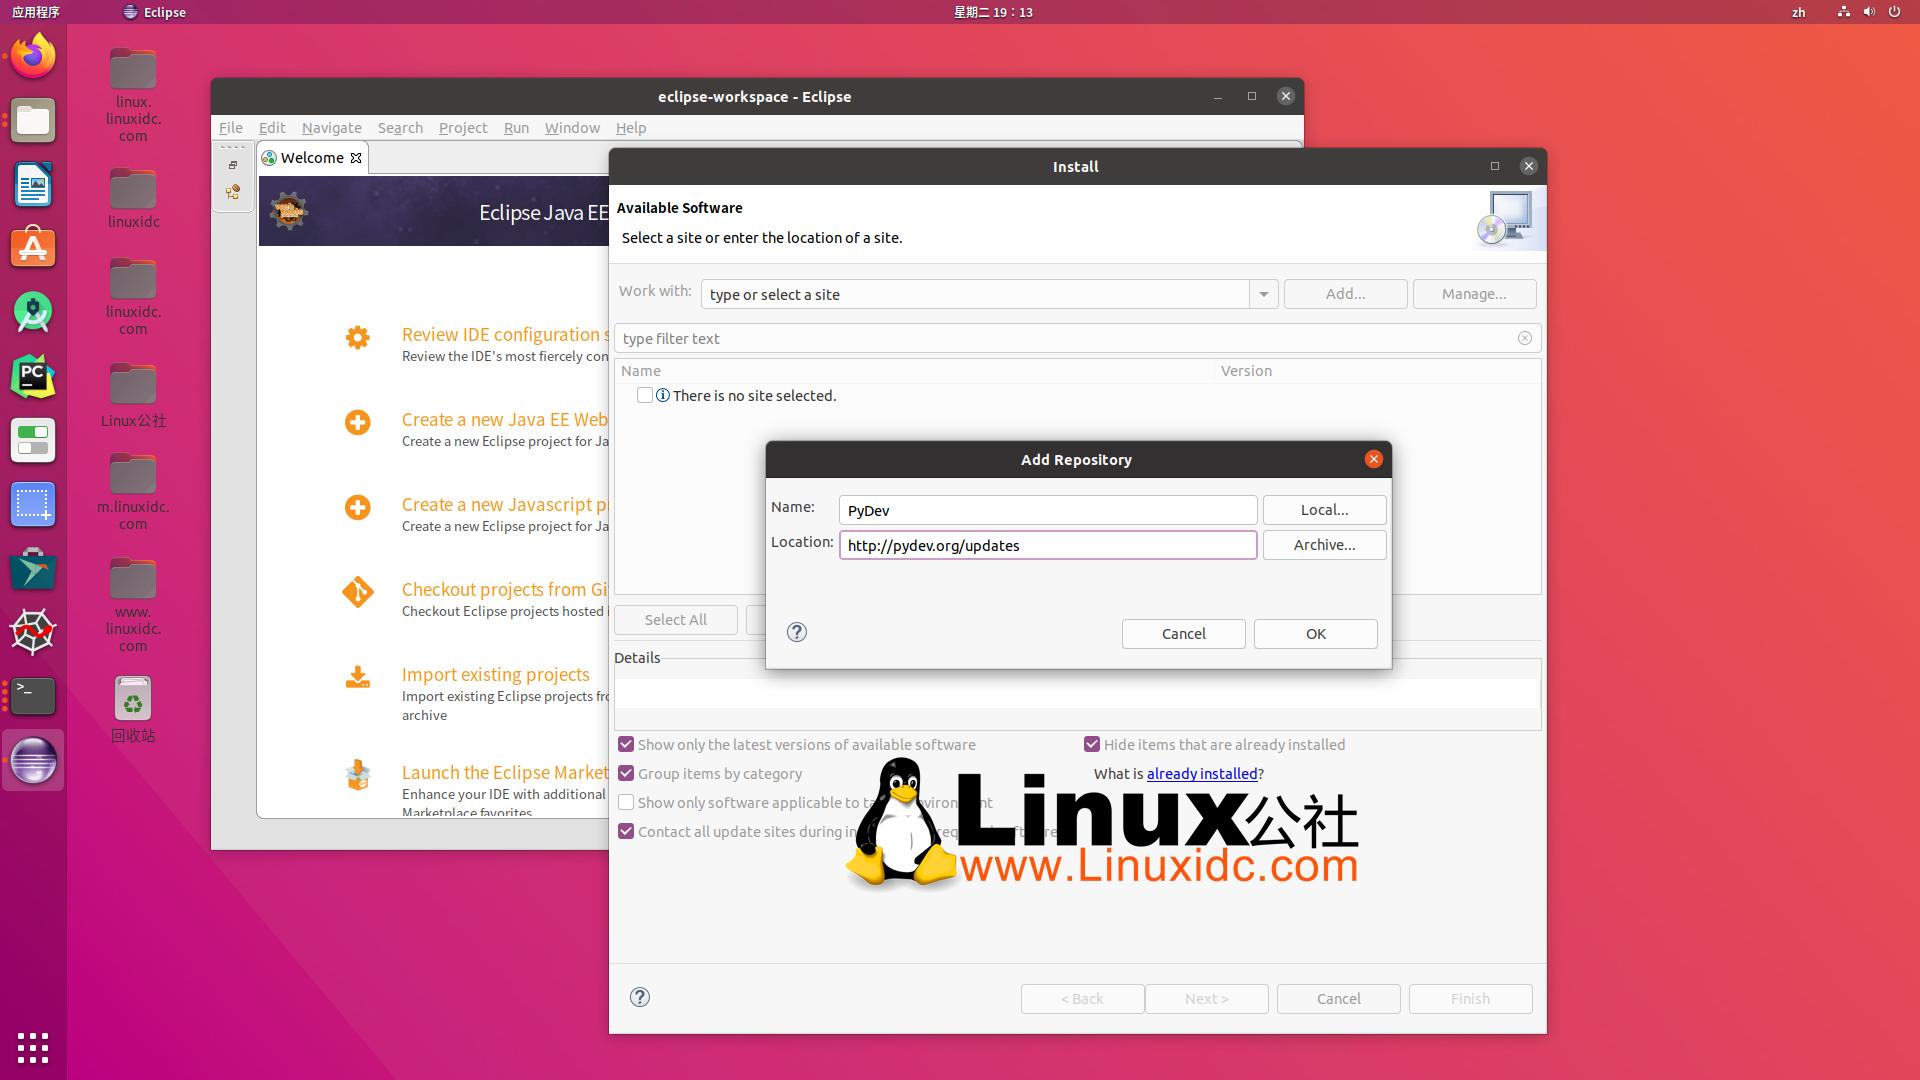 Ubuntu 18.04.4 中使用 Eclipse+PyDev 配置 Python 开发环境